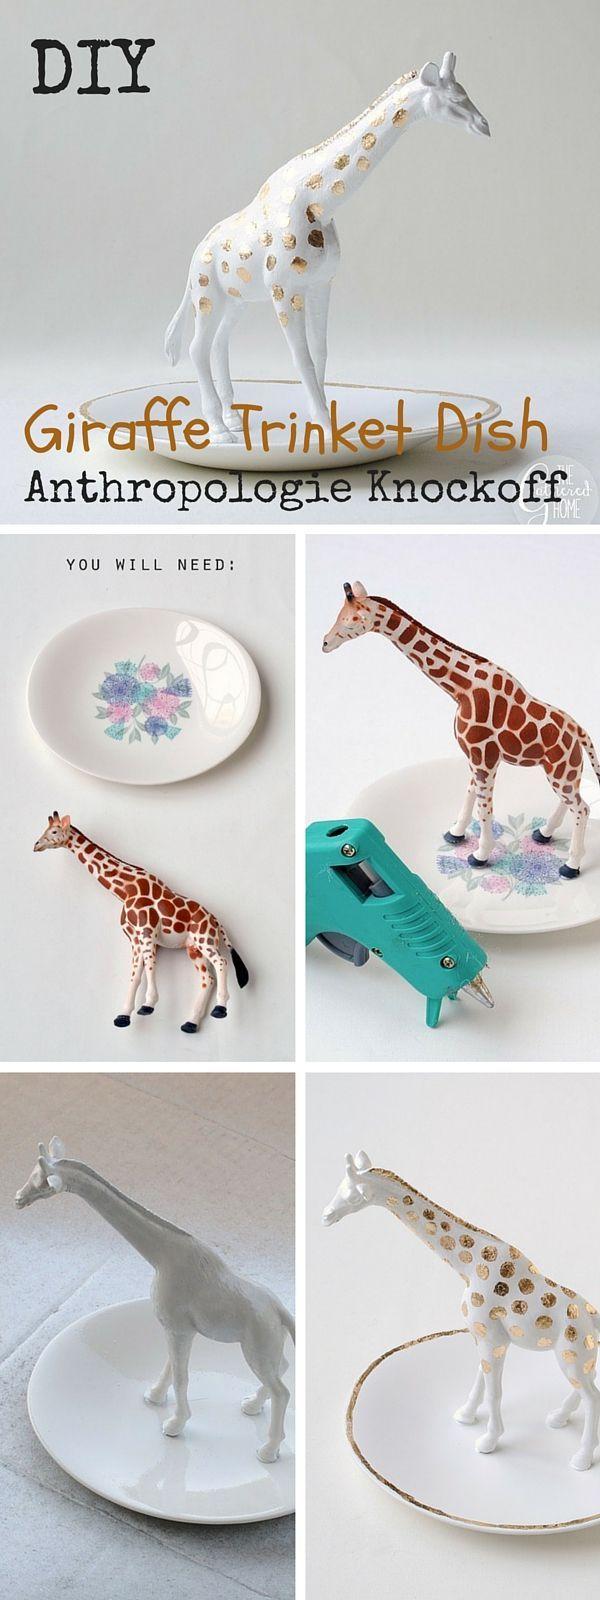 Check out the tutorial: #DIY #Anthropologie Giraffe Trinket Dish Knockoff #crafts #homedecor